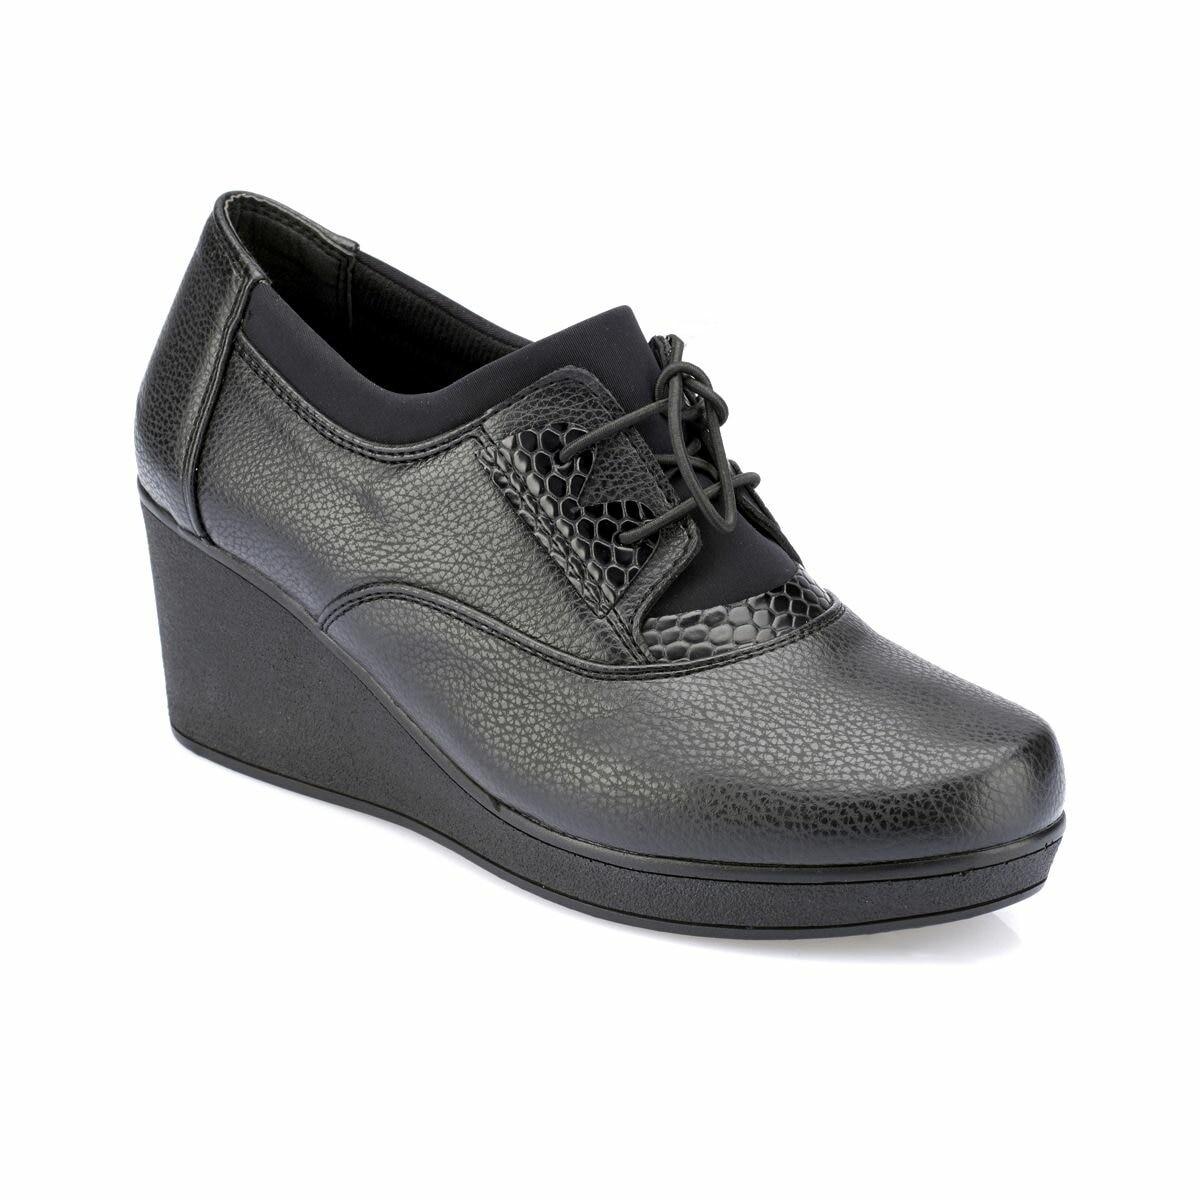 FLO 82.110058.Z Black Women Shoes Polaris 5 Point